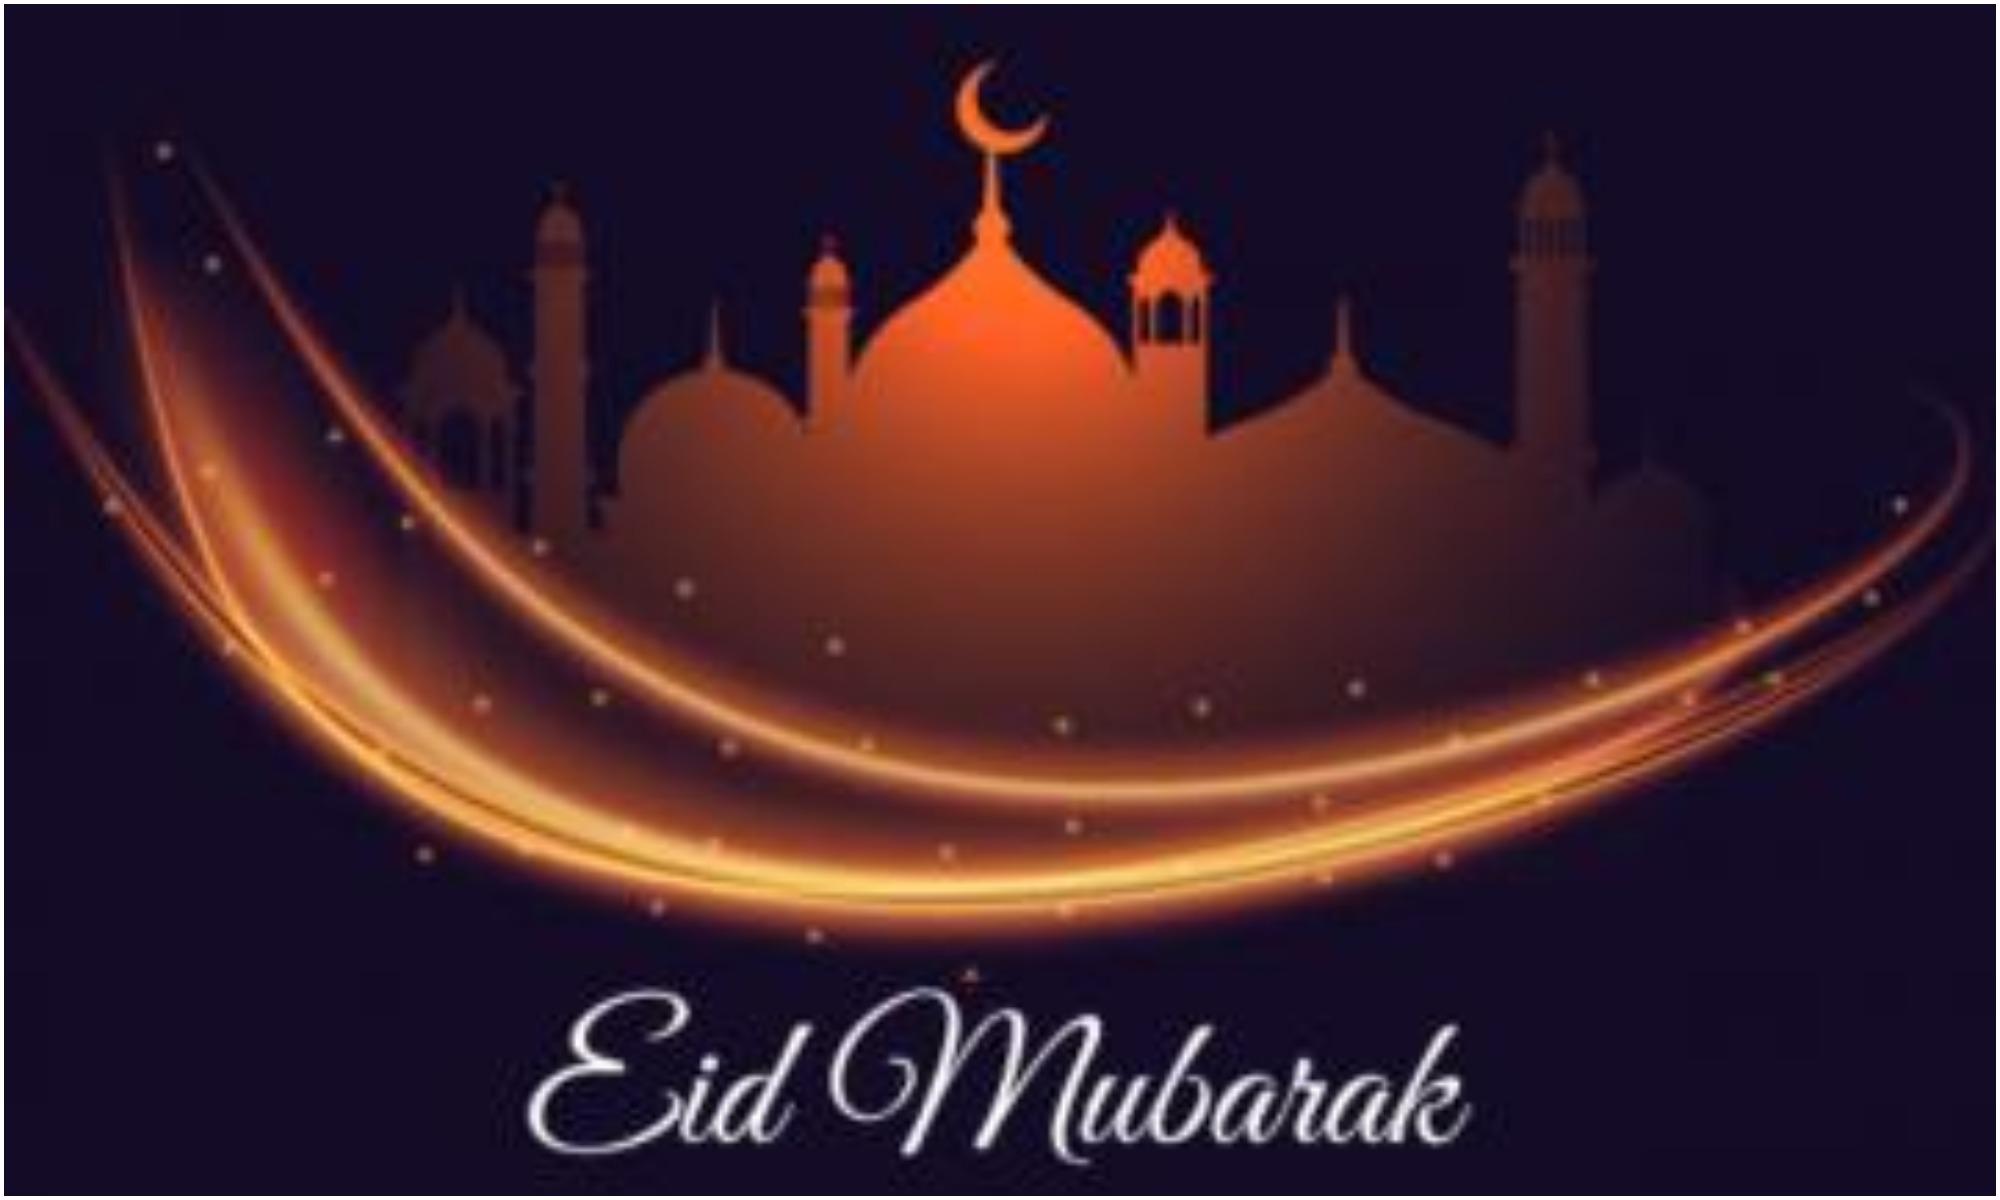 "Kab Hai Eid Ul Fitr 2020 Eid Ul Fitr Date Time History And Why Its Celebrated Eid Ul Fitr 2020 Date À¤•à¤¬ À¤""र À¤• À¤¸ À¤®à¤¨ À¤¯ À¤œ À¤¯ À¤— À¤ˆà¤¦ À¤‰à¤² À¤« À¤¤ À¤° À¤œ À¤¨ À¤ À¤‡à¤¸à¤• À¤®à¤¹à¤¤ À¤µ À¤""र À¤‡à¤¤ À¤¹ À¤¸"